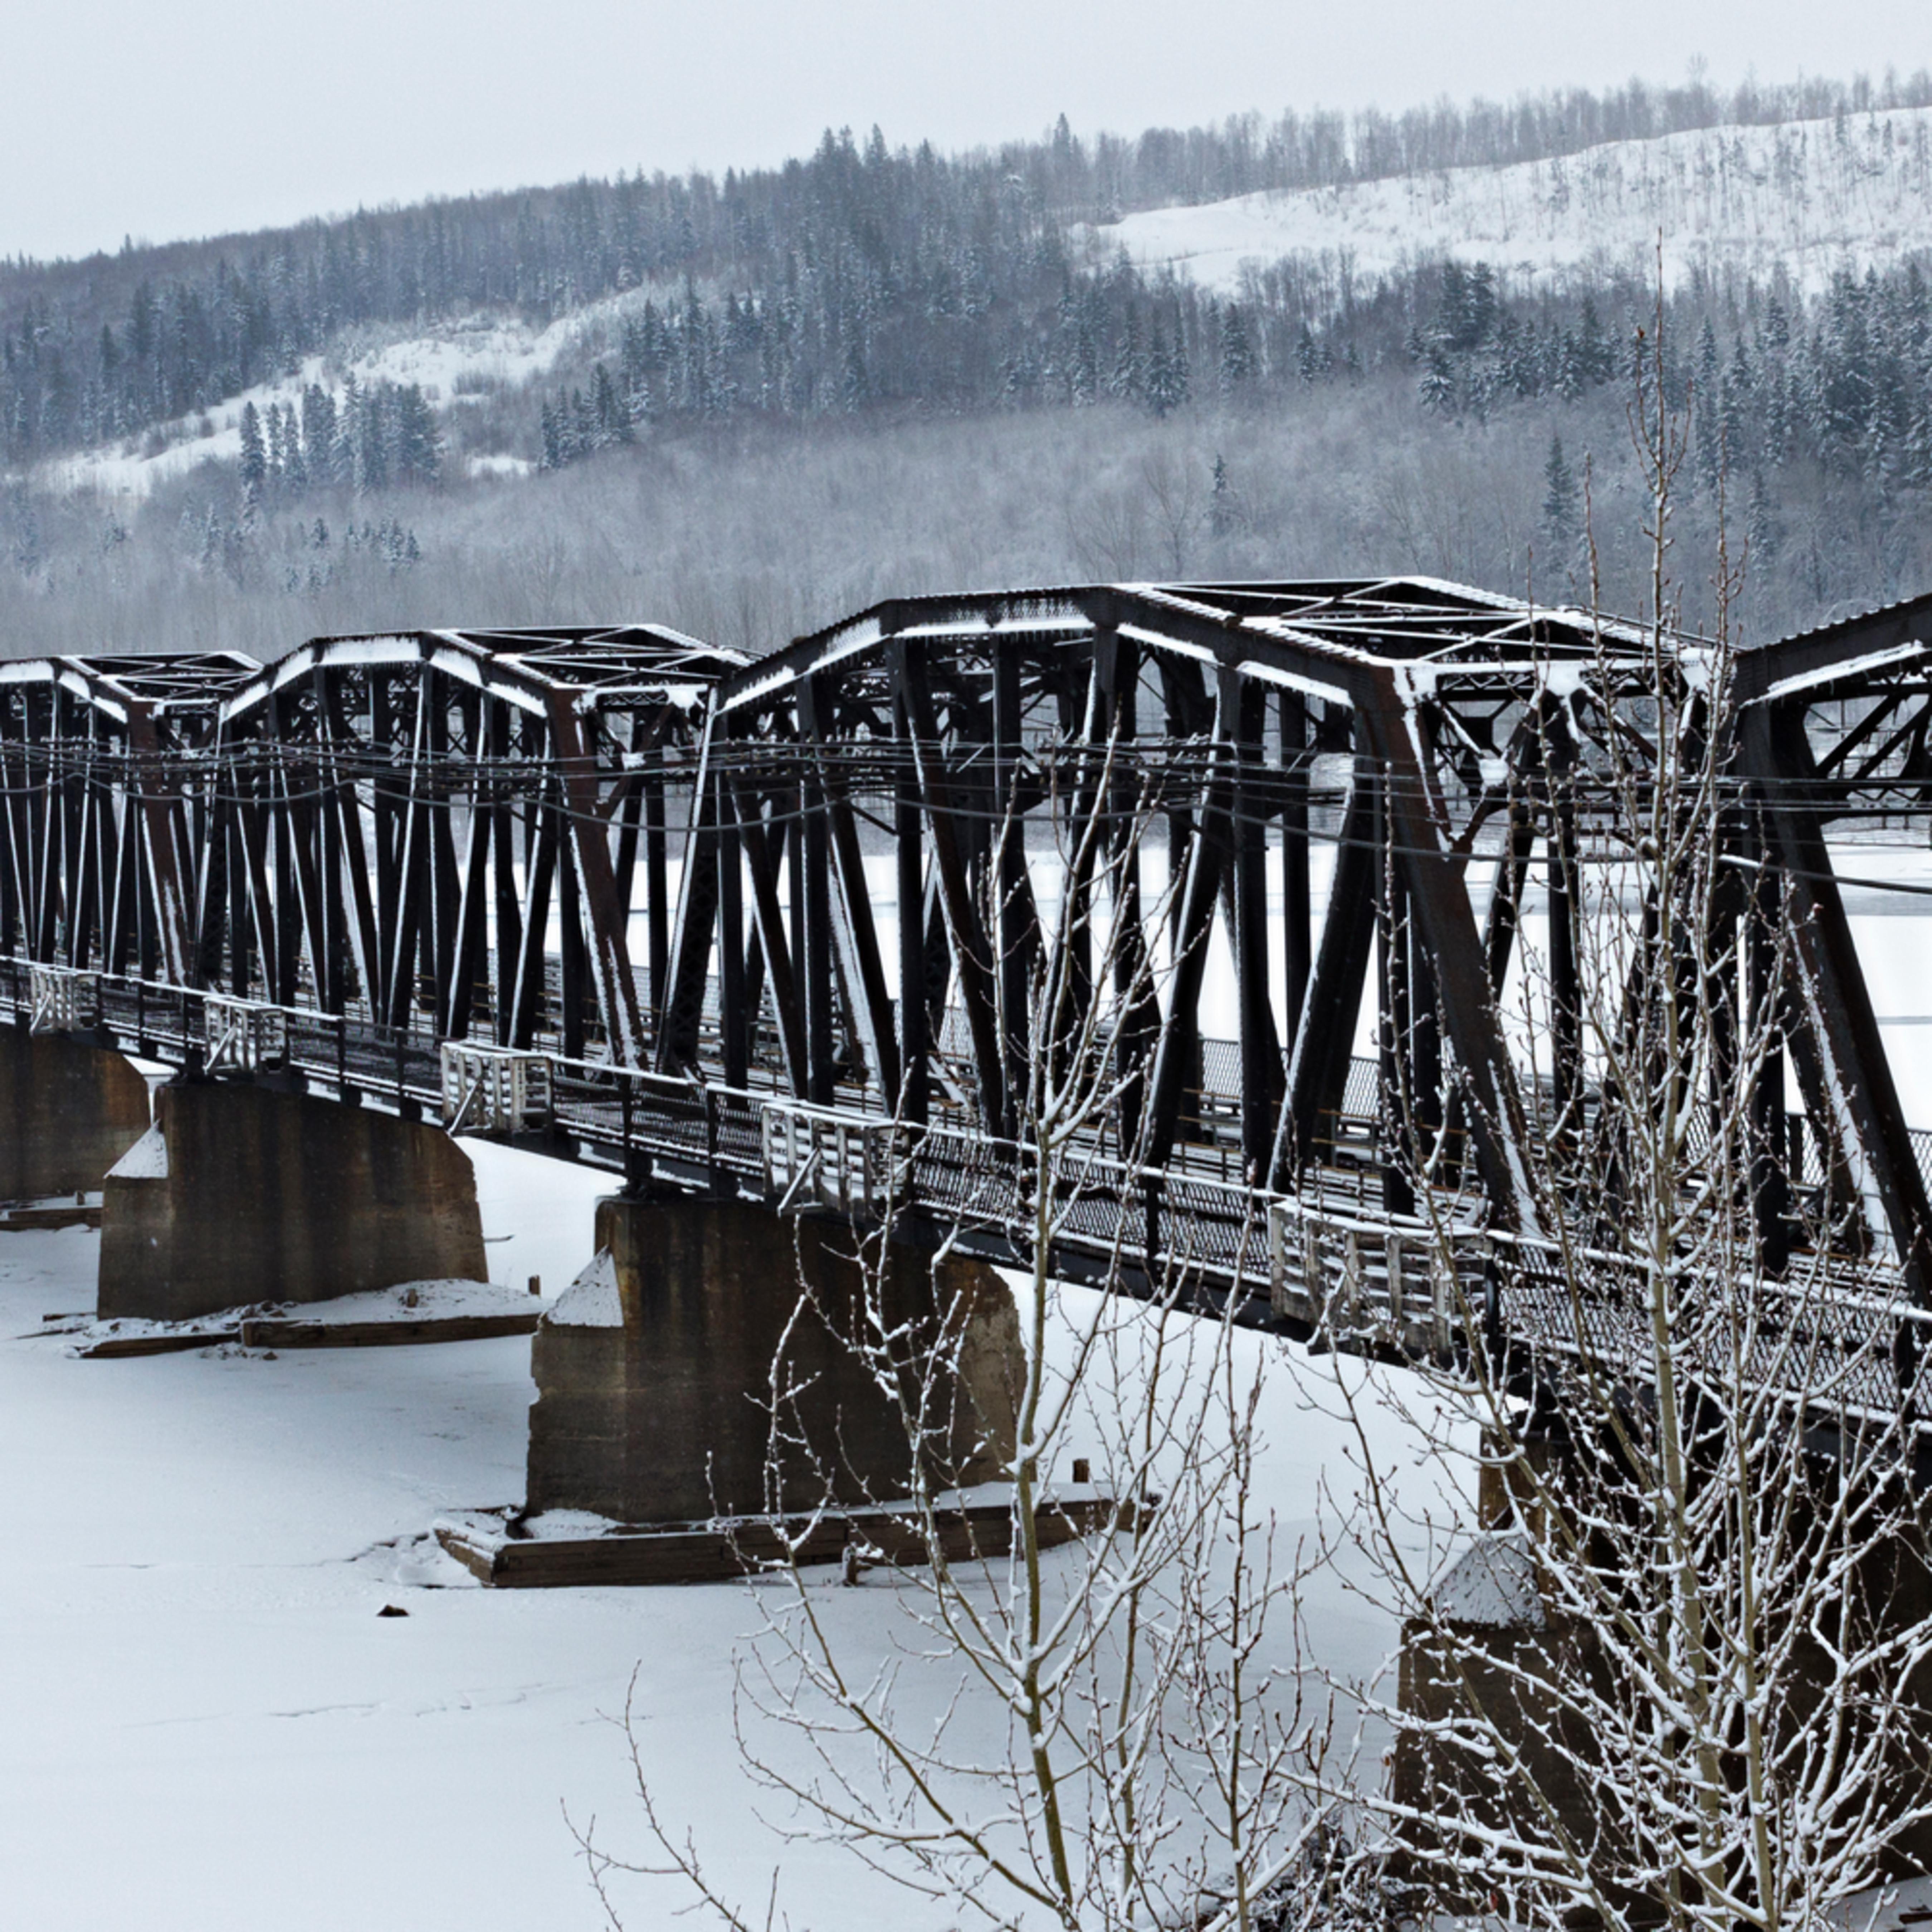 Cn train bridge no 1 vwa0k9